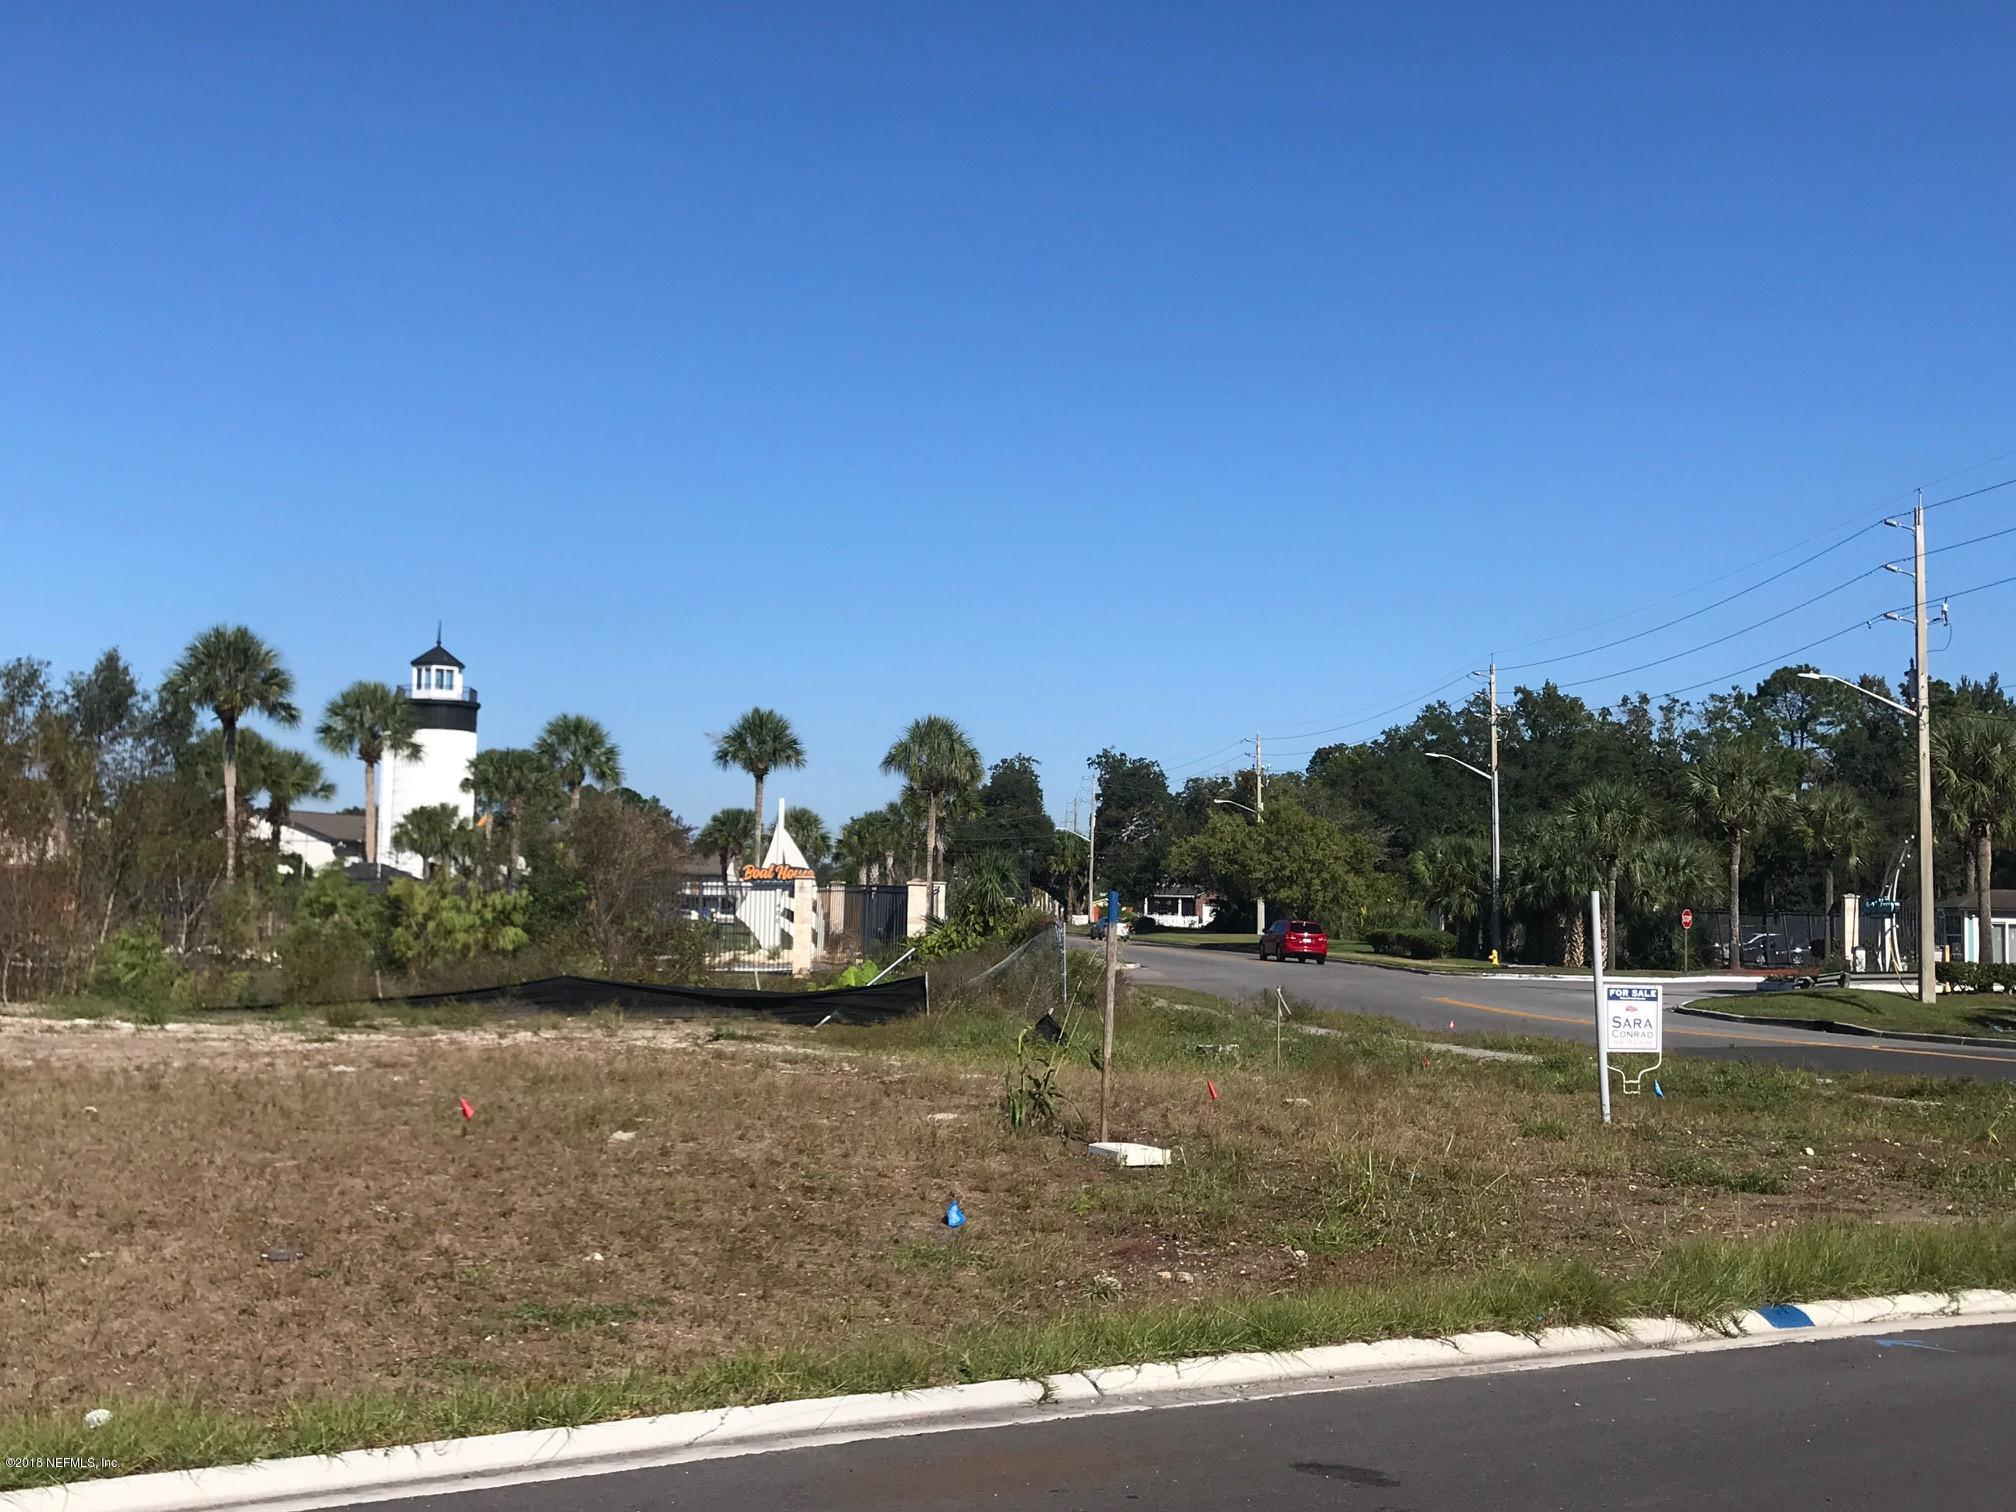 0 CENTURY 21, JACKSONVILLE, FLORIDA 32216, ,Vacant land,For sale,CENTURY 21,967447